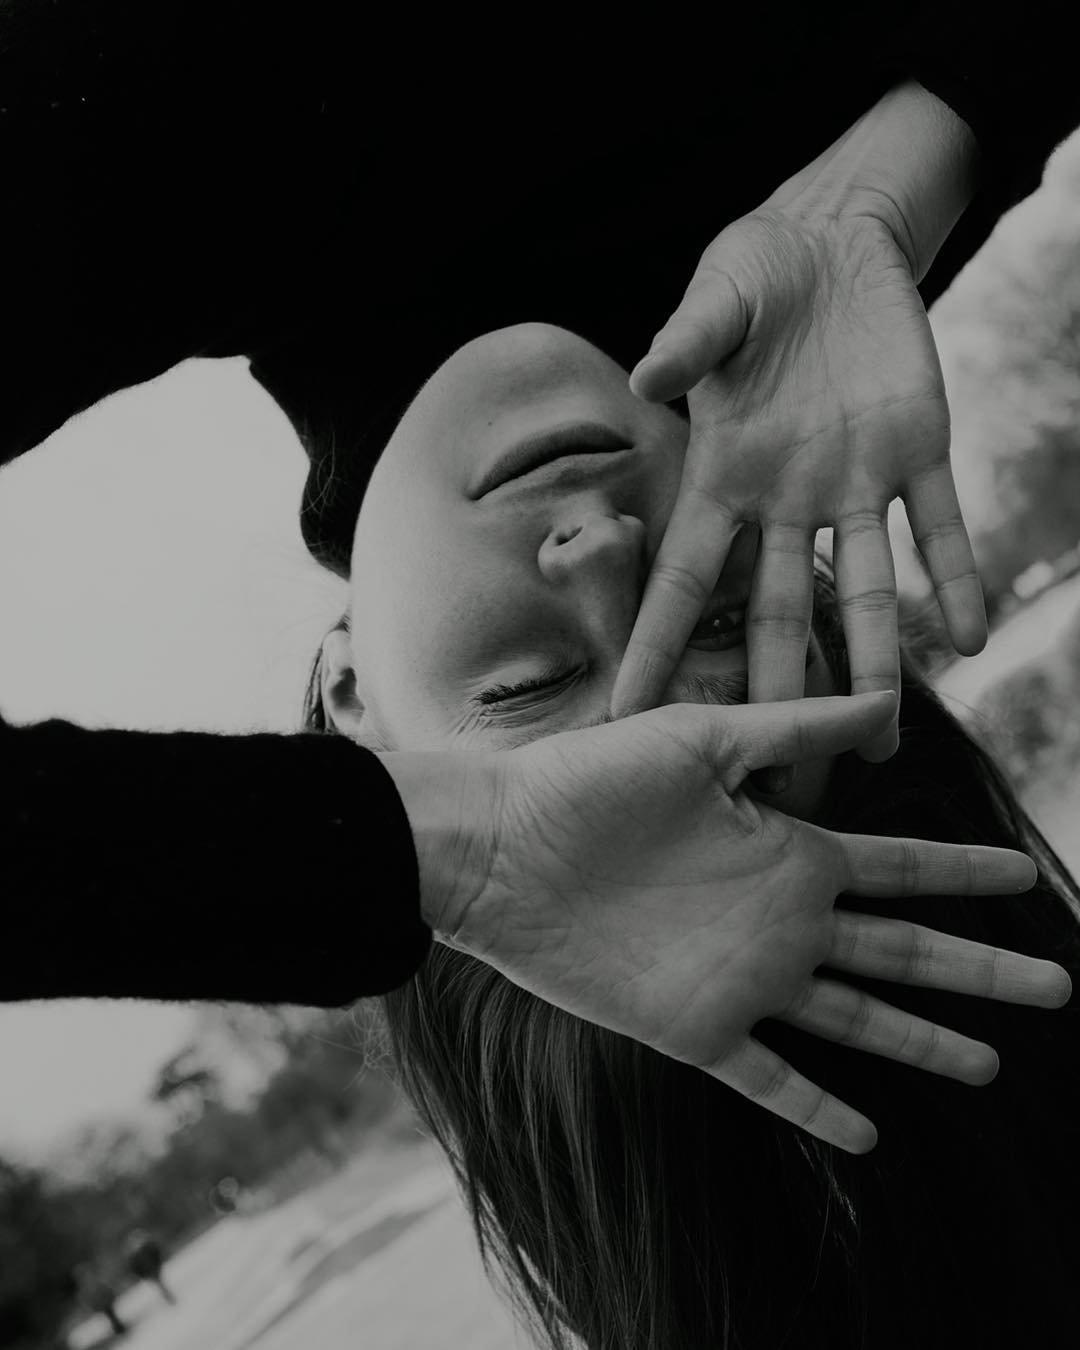 beautiful_black_and_white_portrait_photography_37.jpg